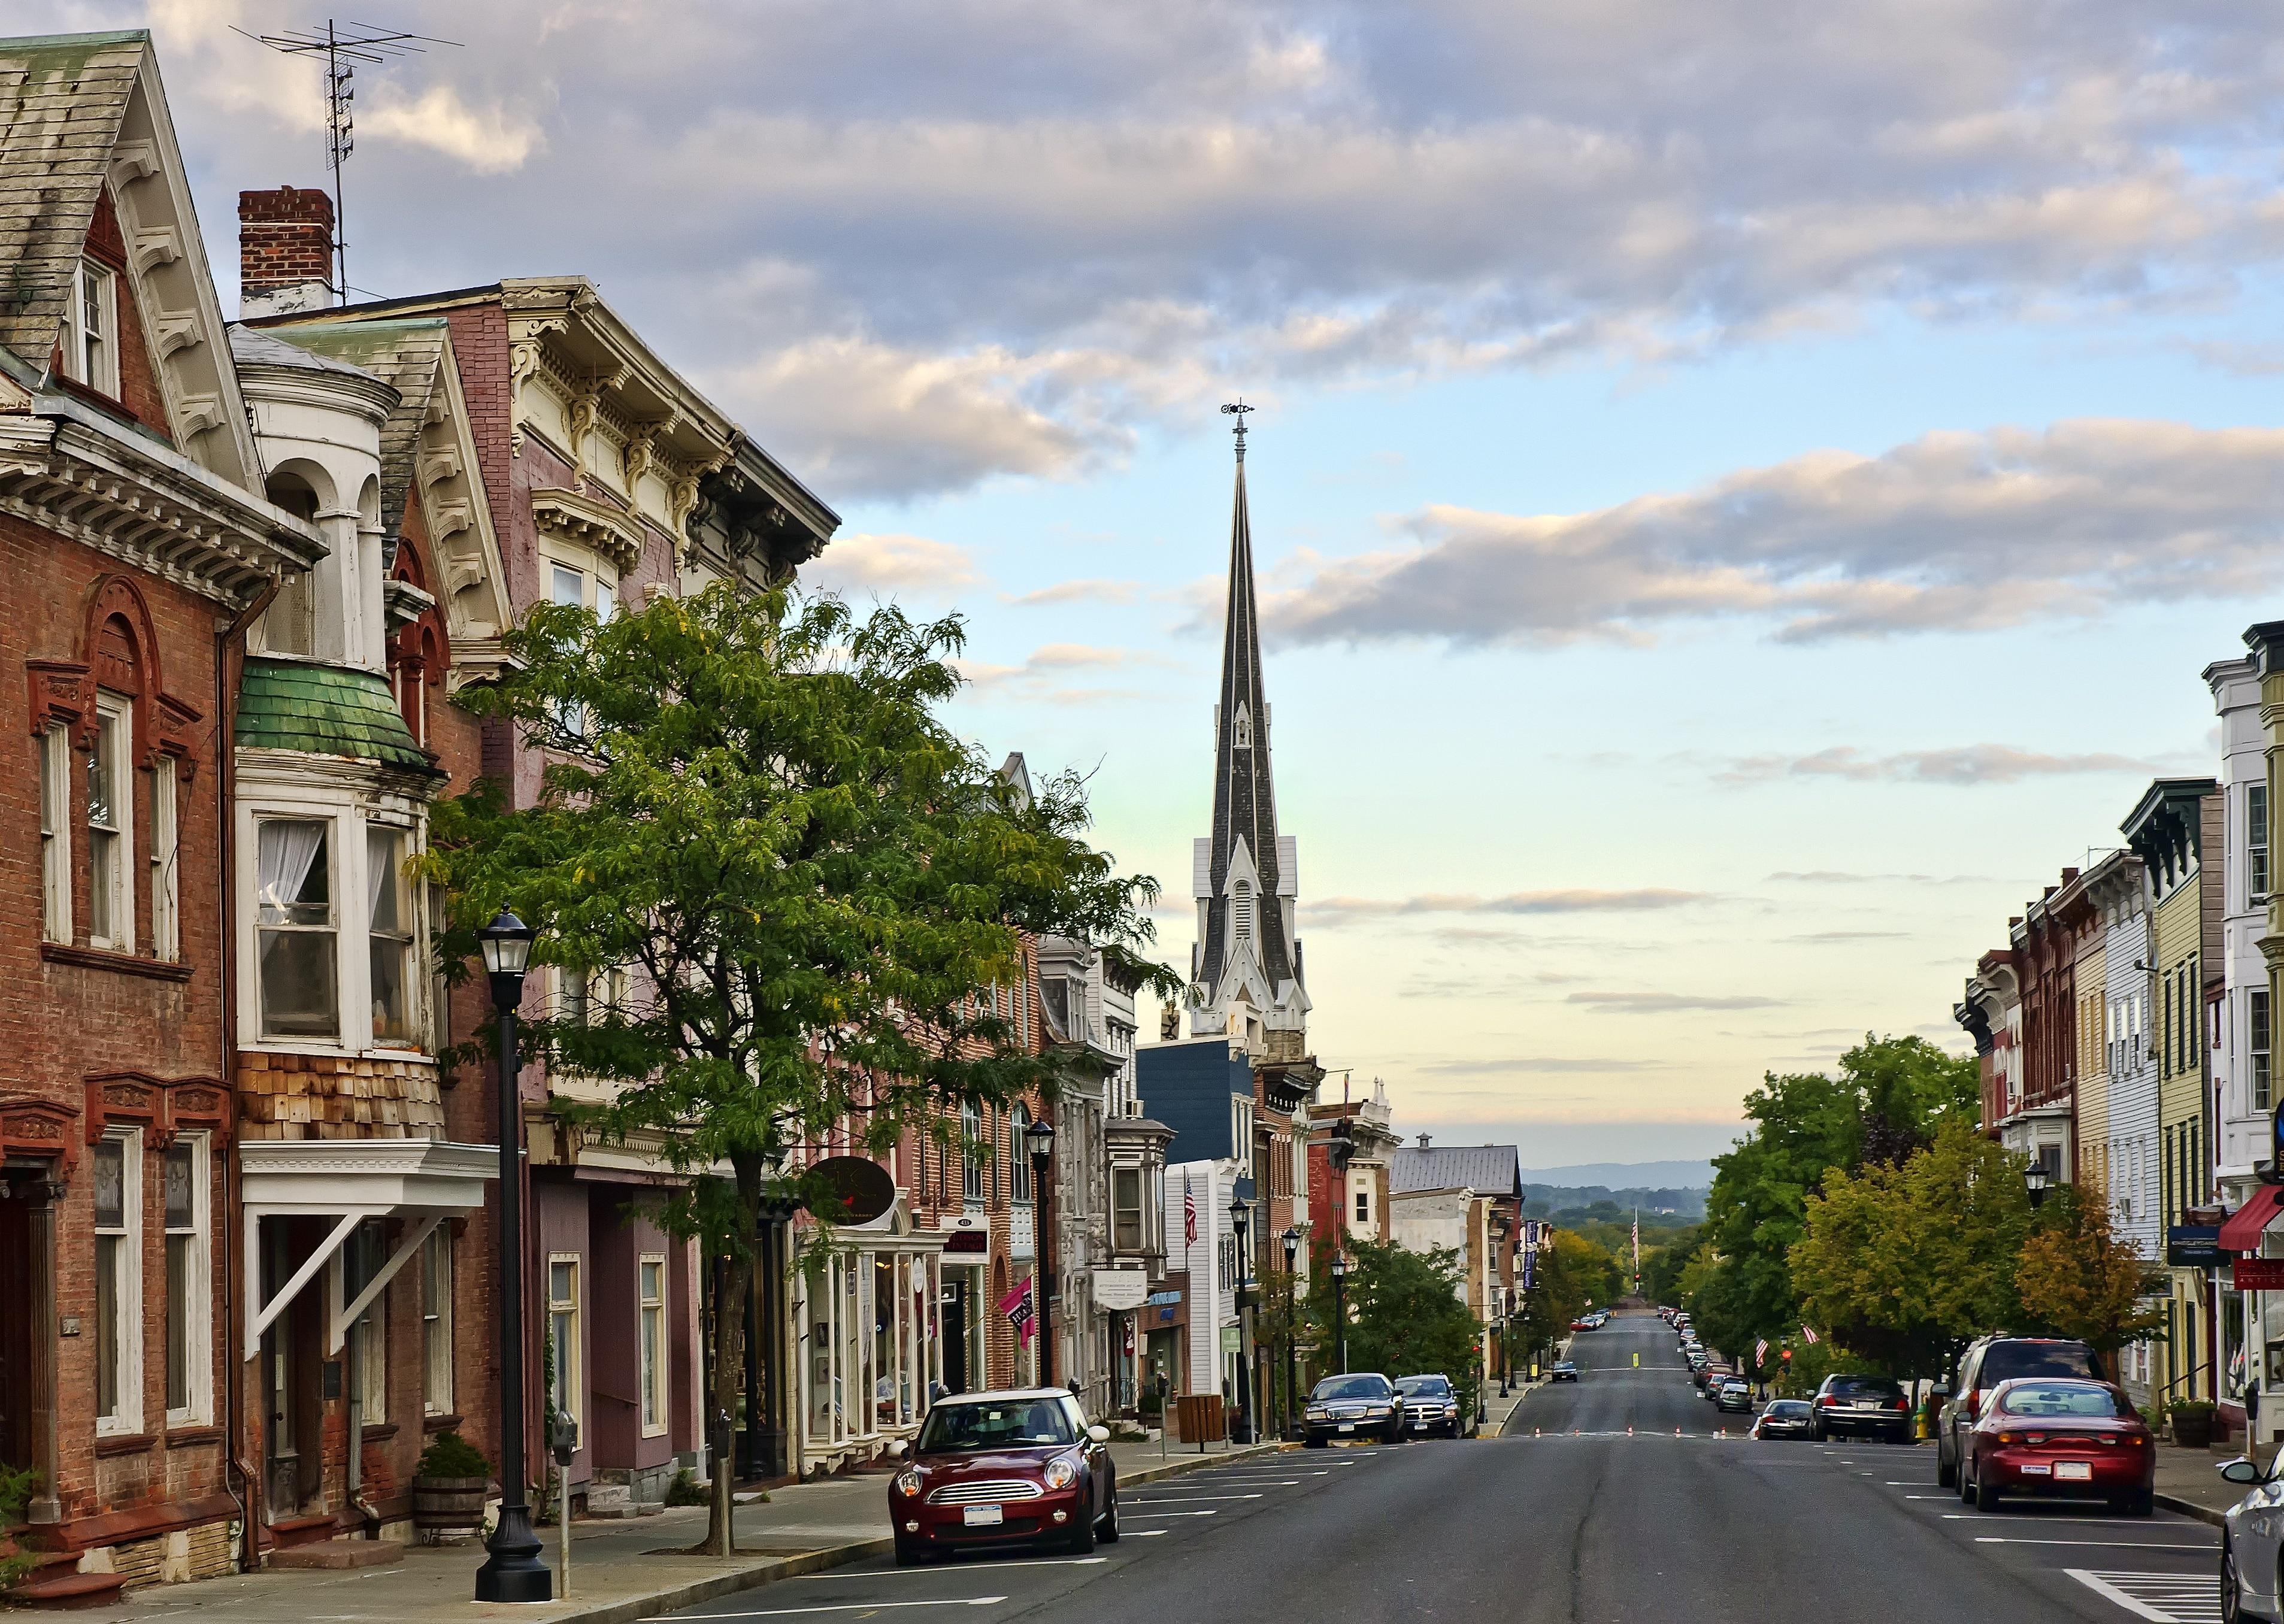 Hudson, New York, United States of America